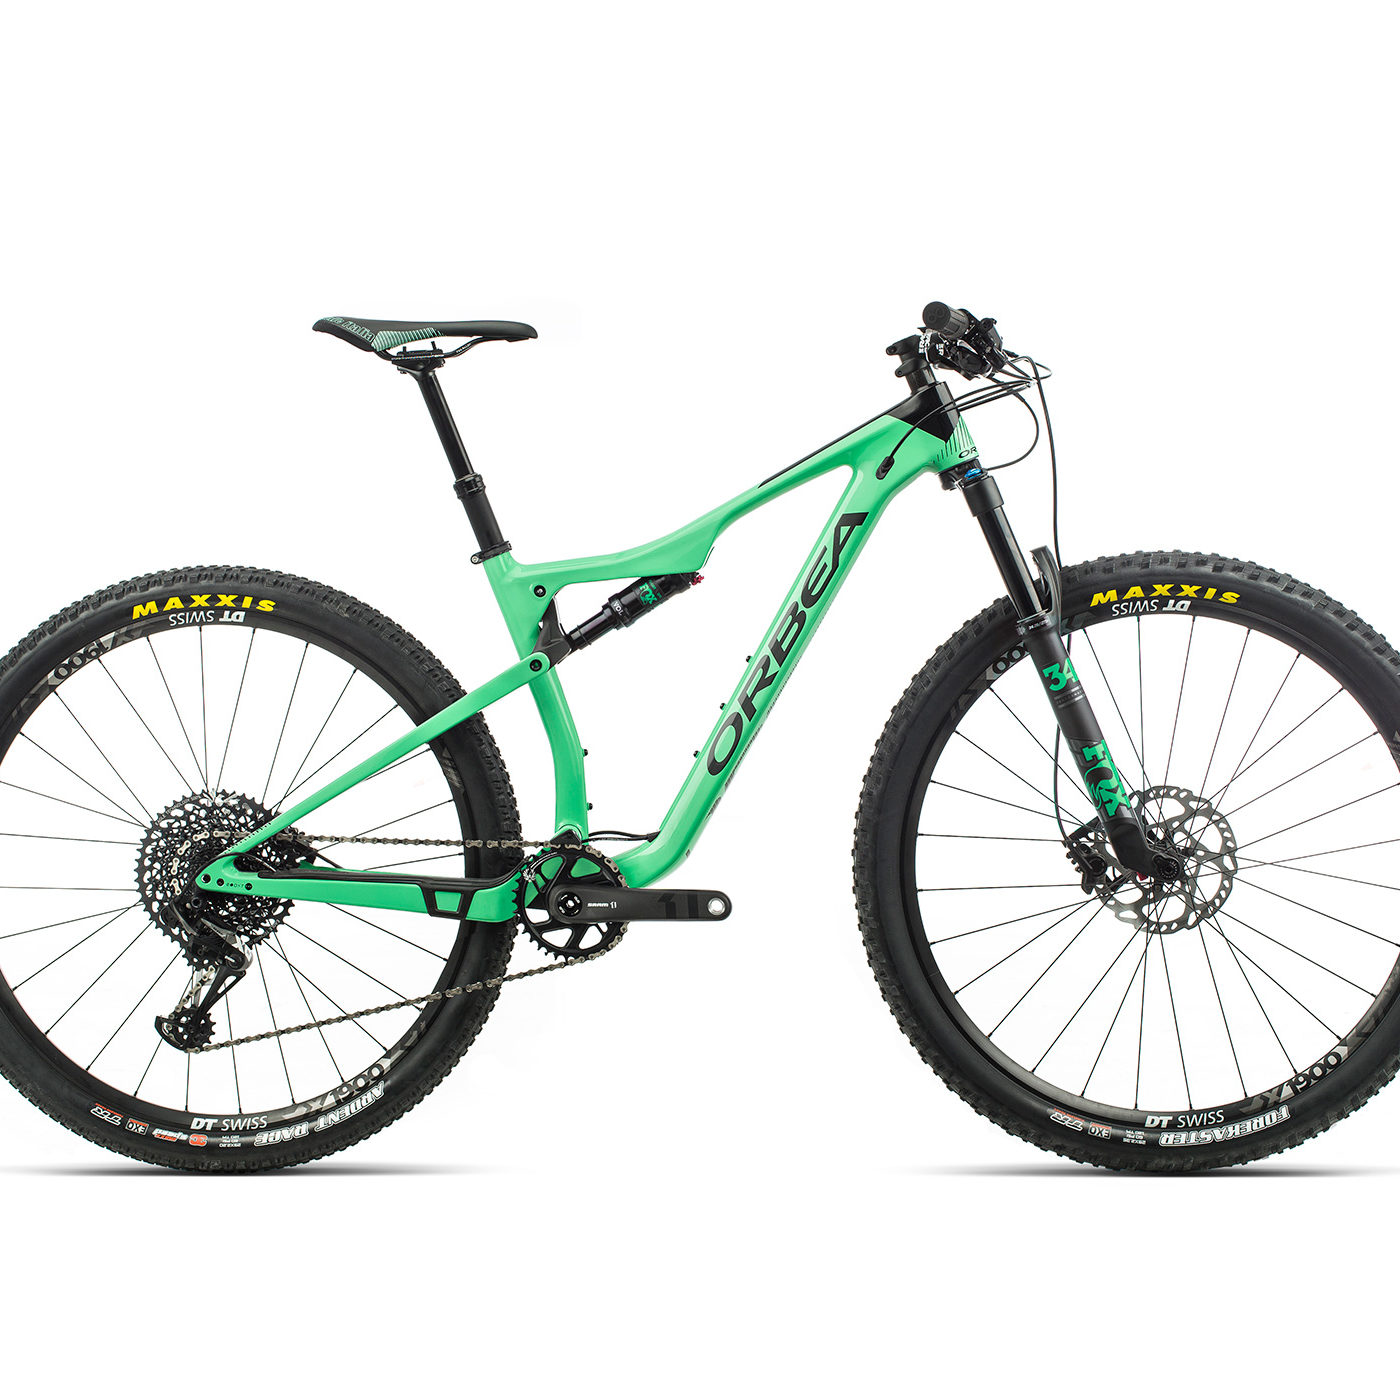 ORBEA OIZ 29 M20TR - MUNT / ZWART (GLOSS) @G-Bikes